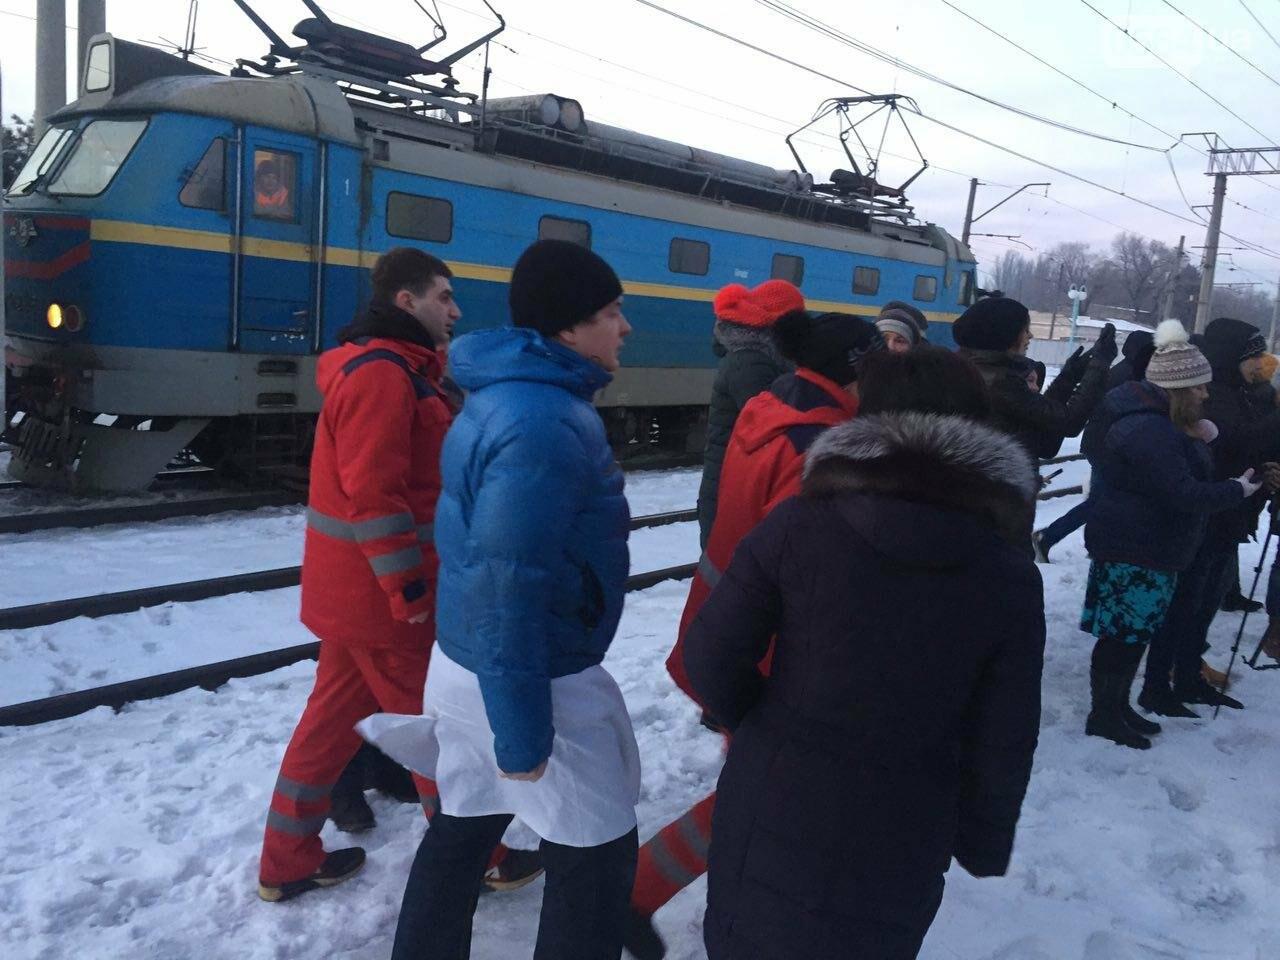 В Кривой Рог вернулся журналист Вячеслав Волк, тяжело раненый во время учений резервистов (ФОТО), фото-8